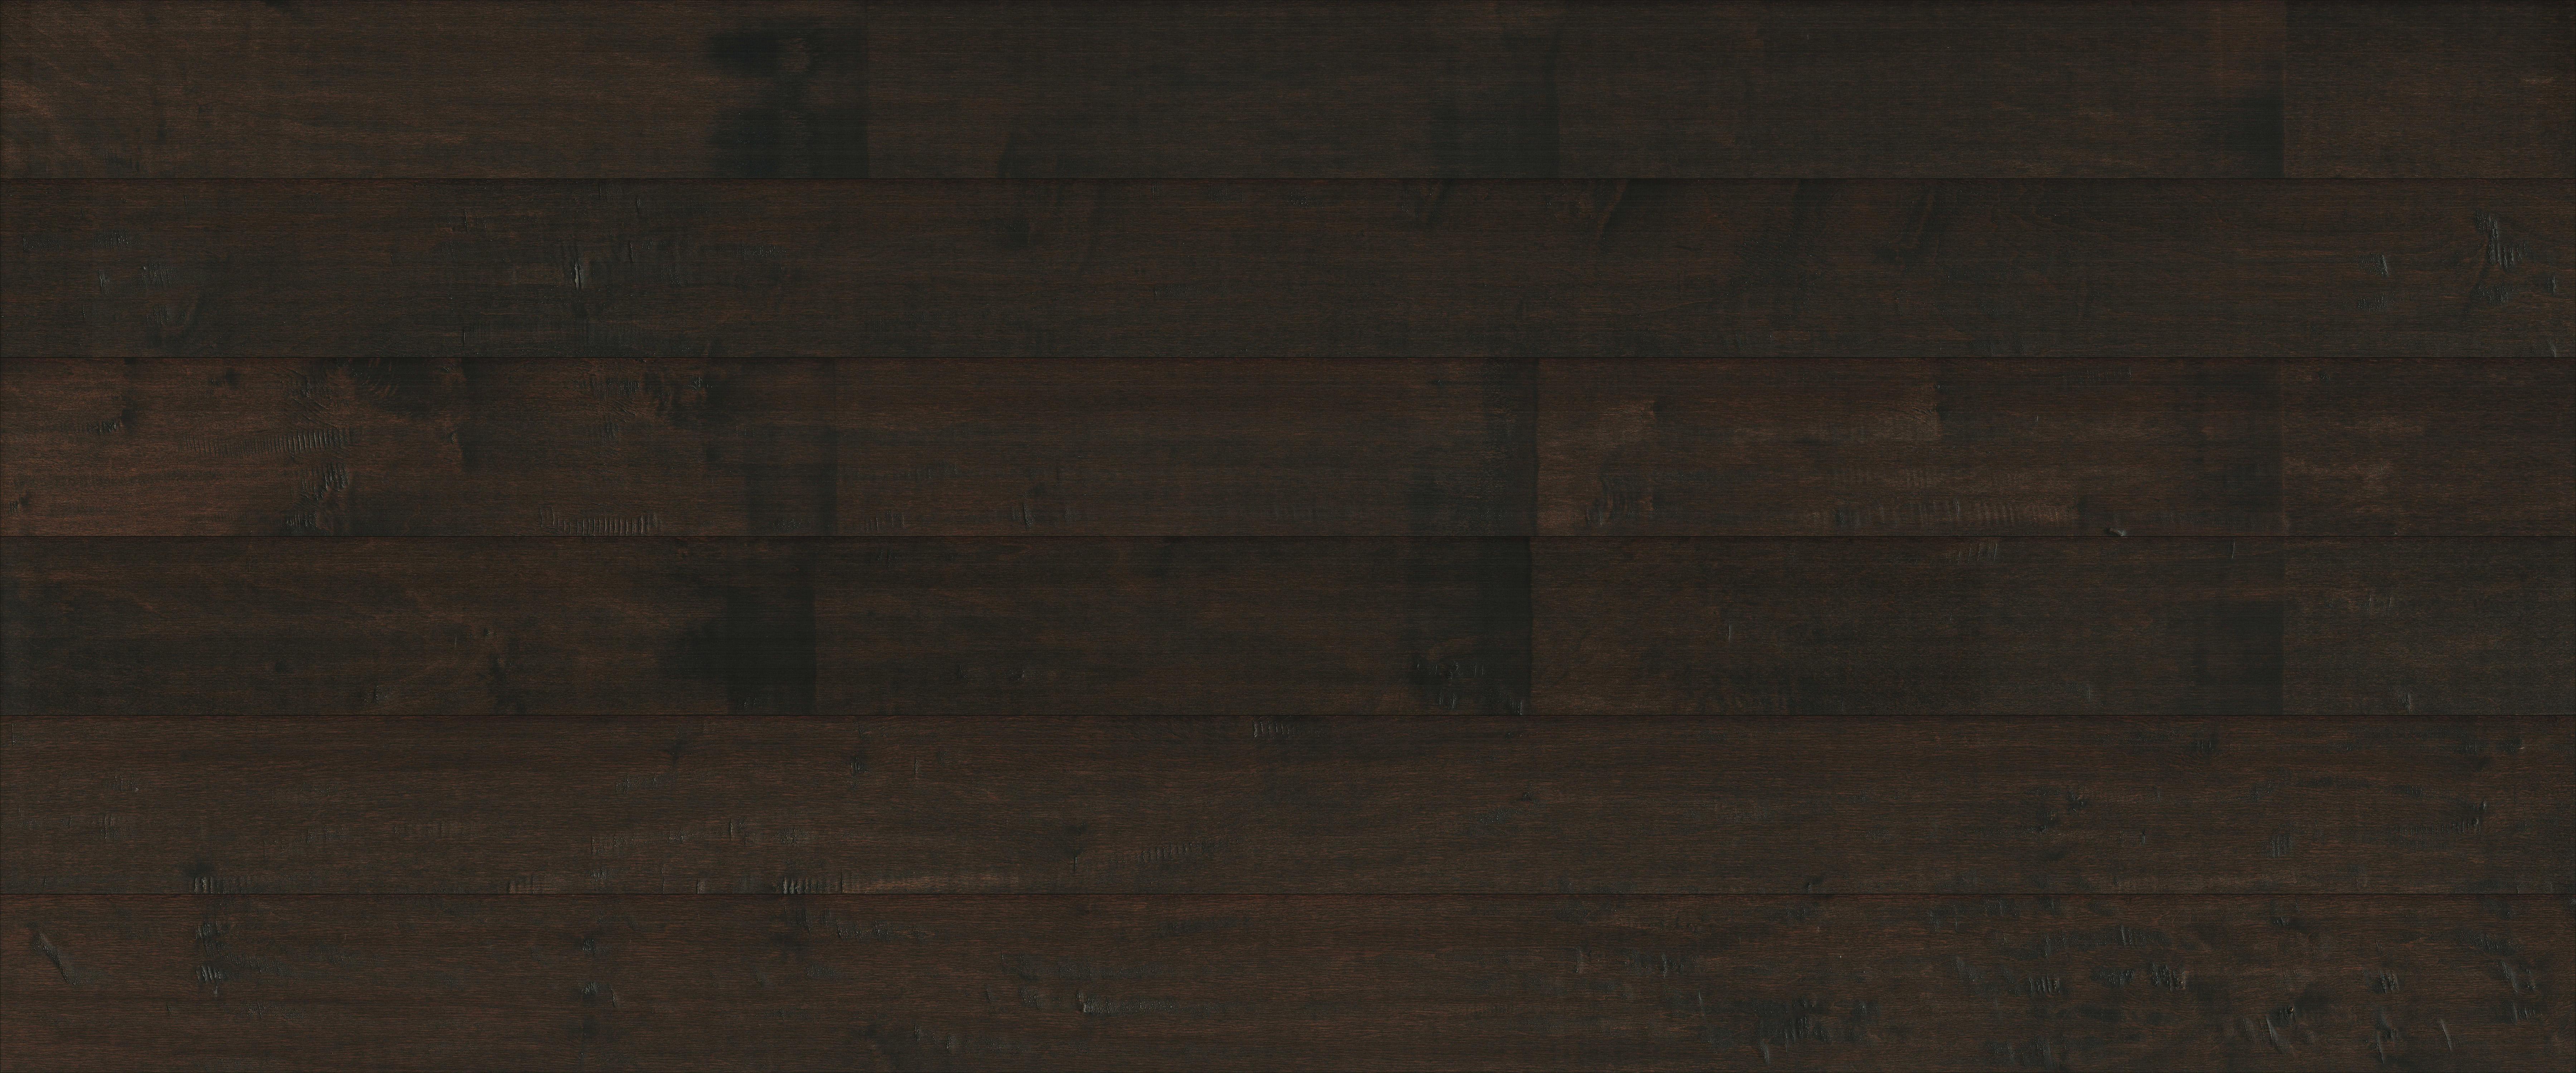 3 8 x 2 1 4 hardwood flooring of mullican san marco sculpted maple dark mocha 5 engineered hardwood within mullican san marco sculpted maple dark mocha 5 engineered hardwood flooring